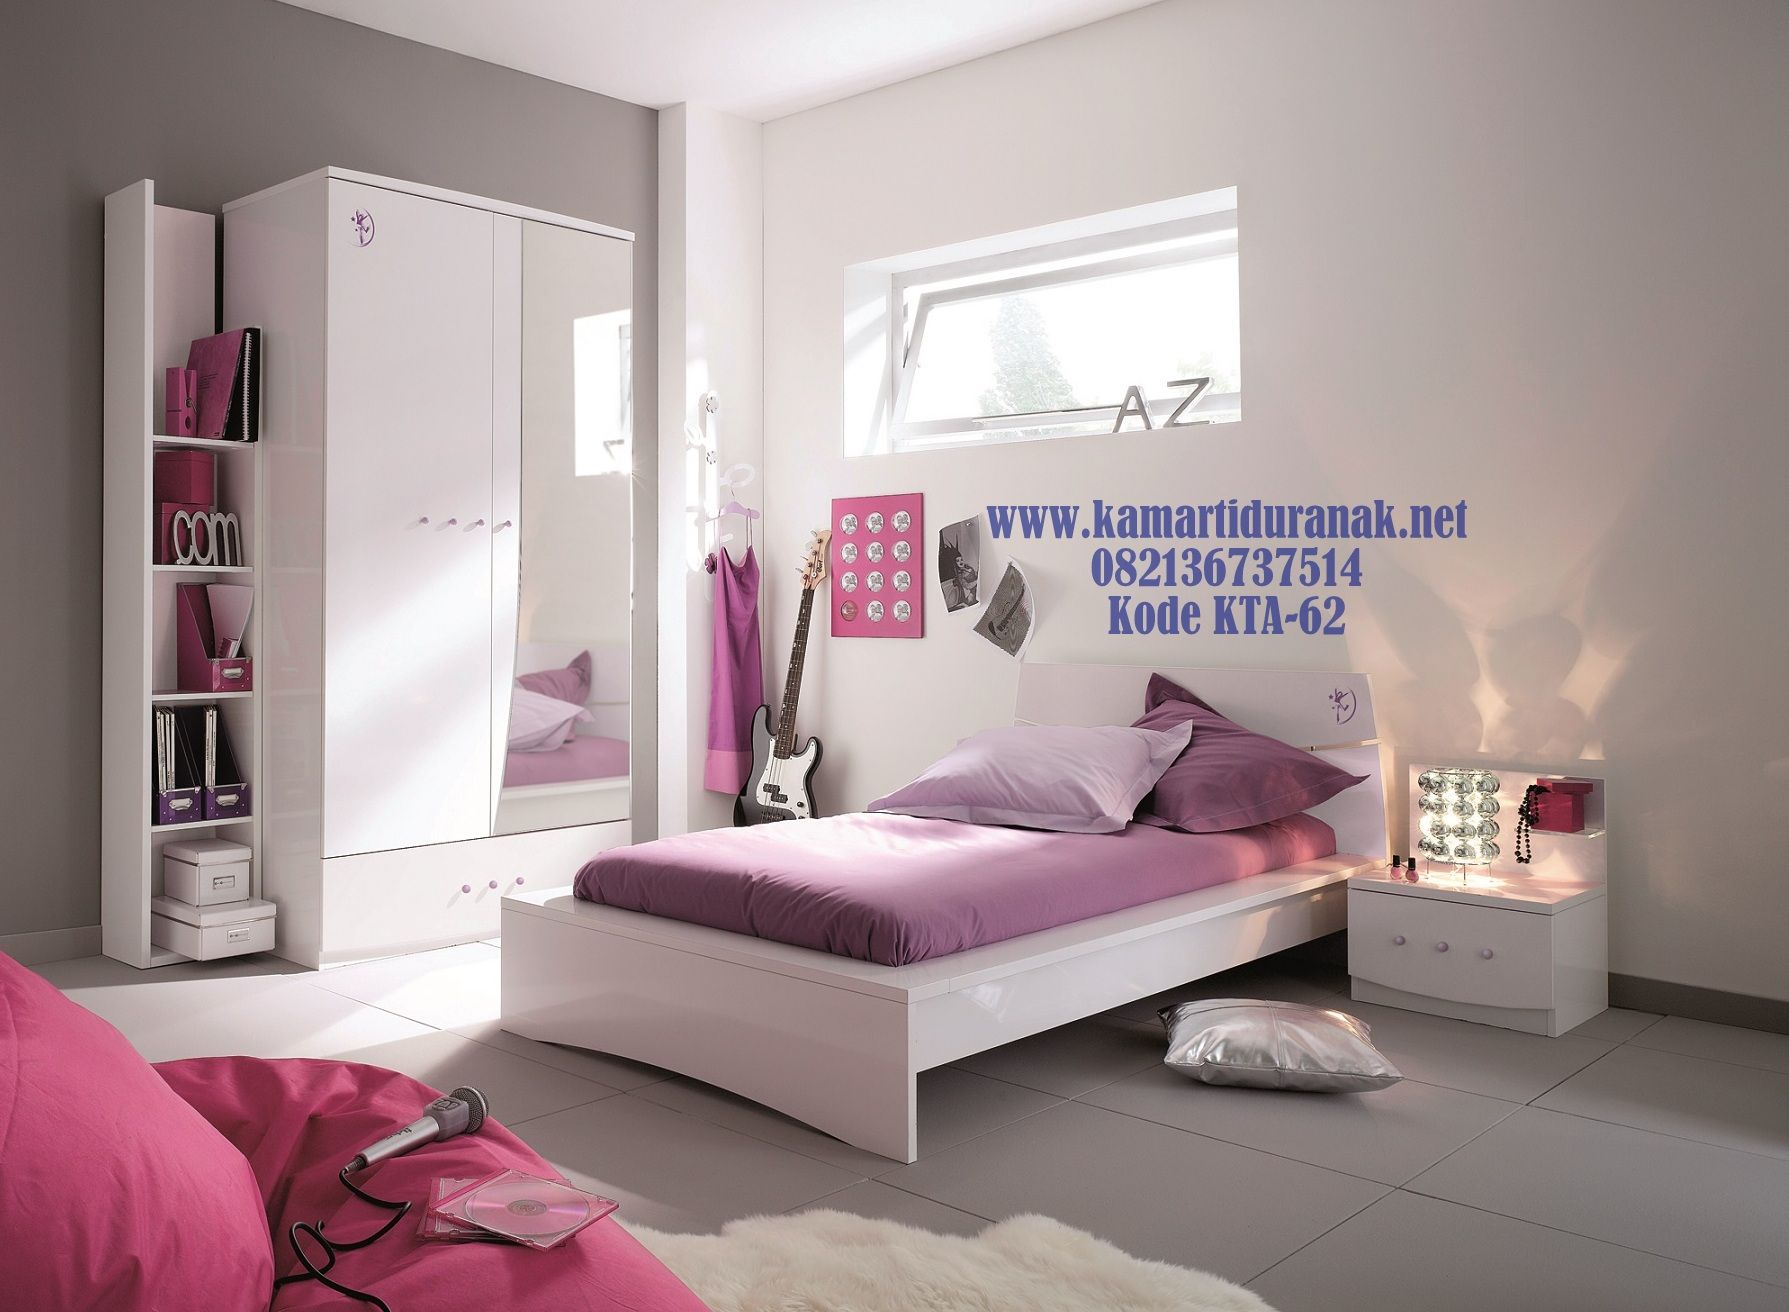 Bed cover my love anak - Desain Kamar Set Anak Minimalis Ungu Modern Simple Naura Konsep Kamar